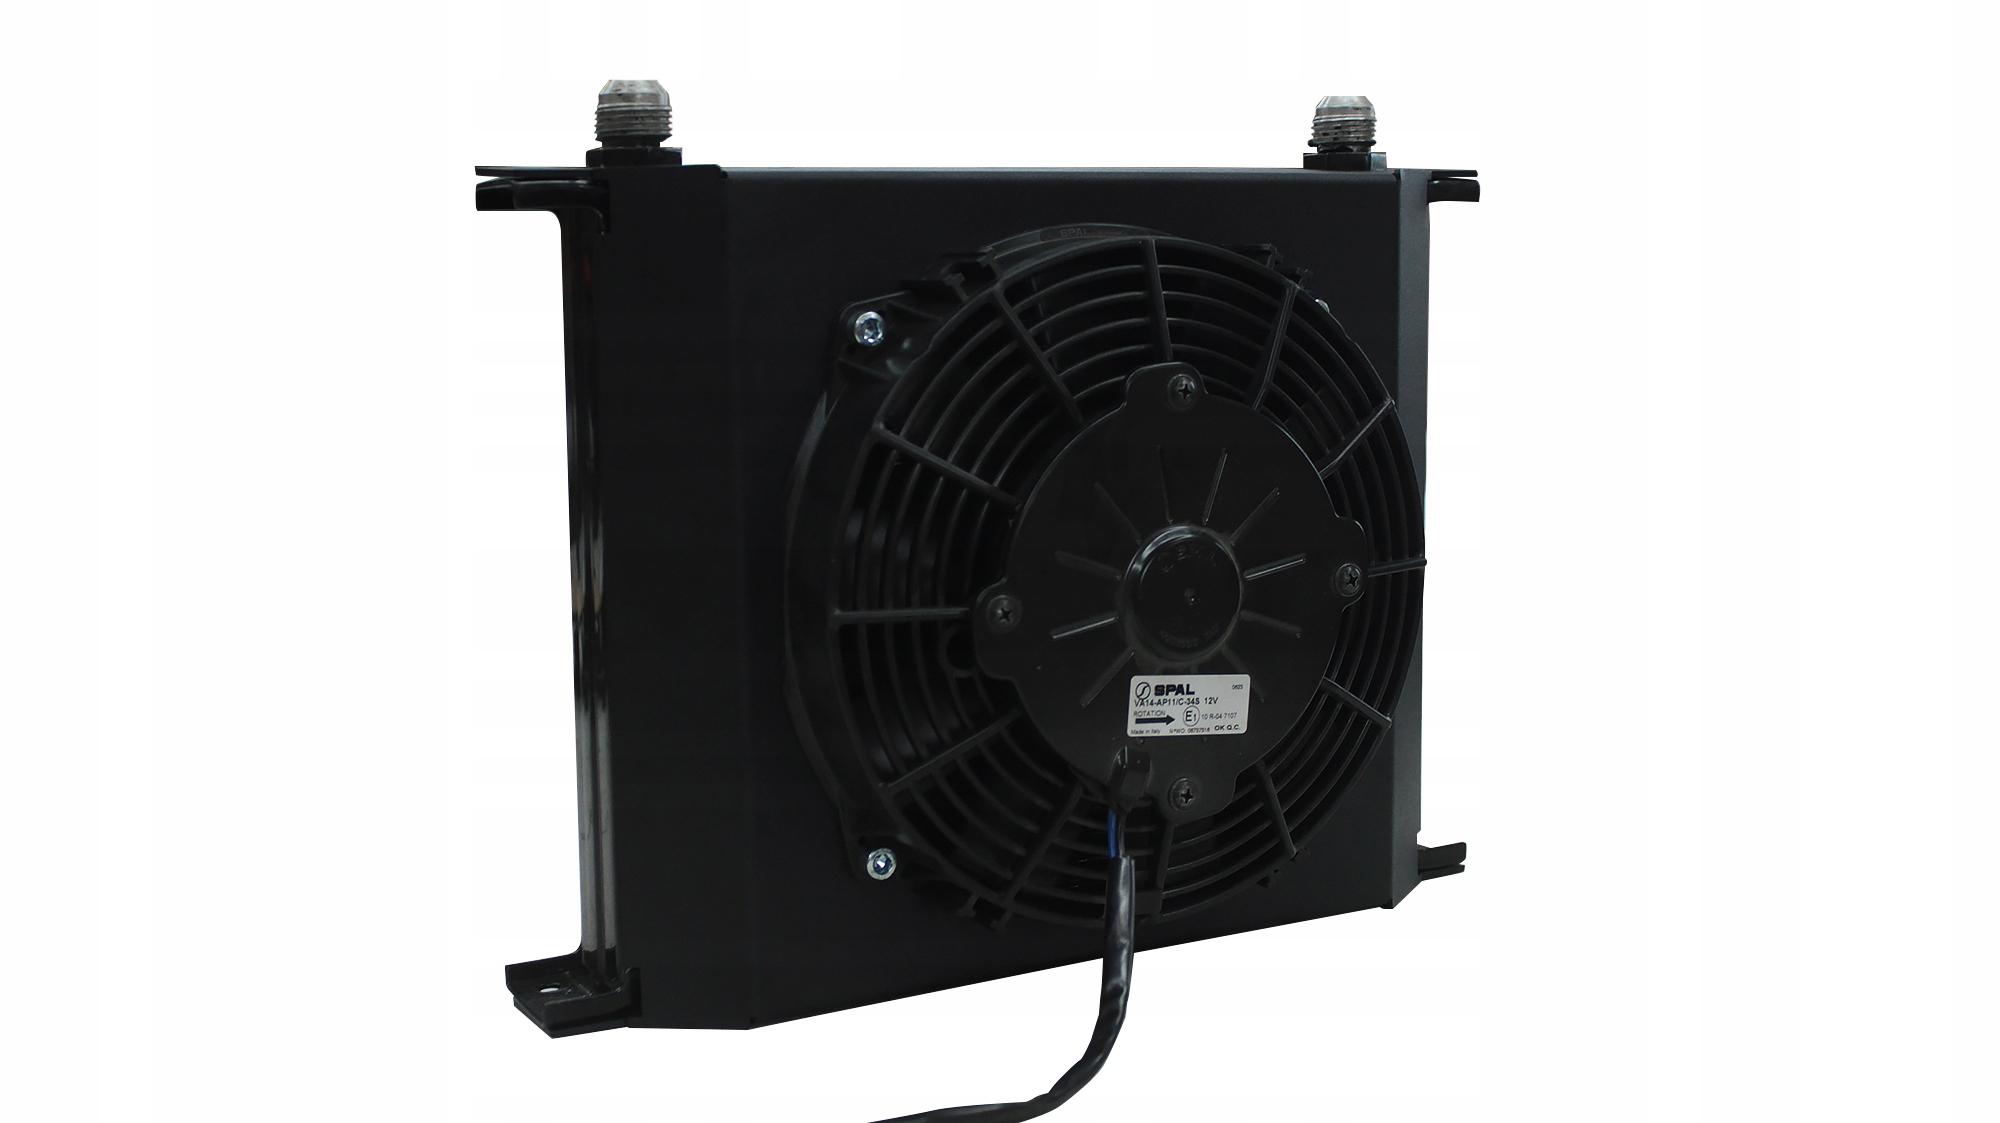 крышка диффузор вентилятор мельница 7